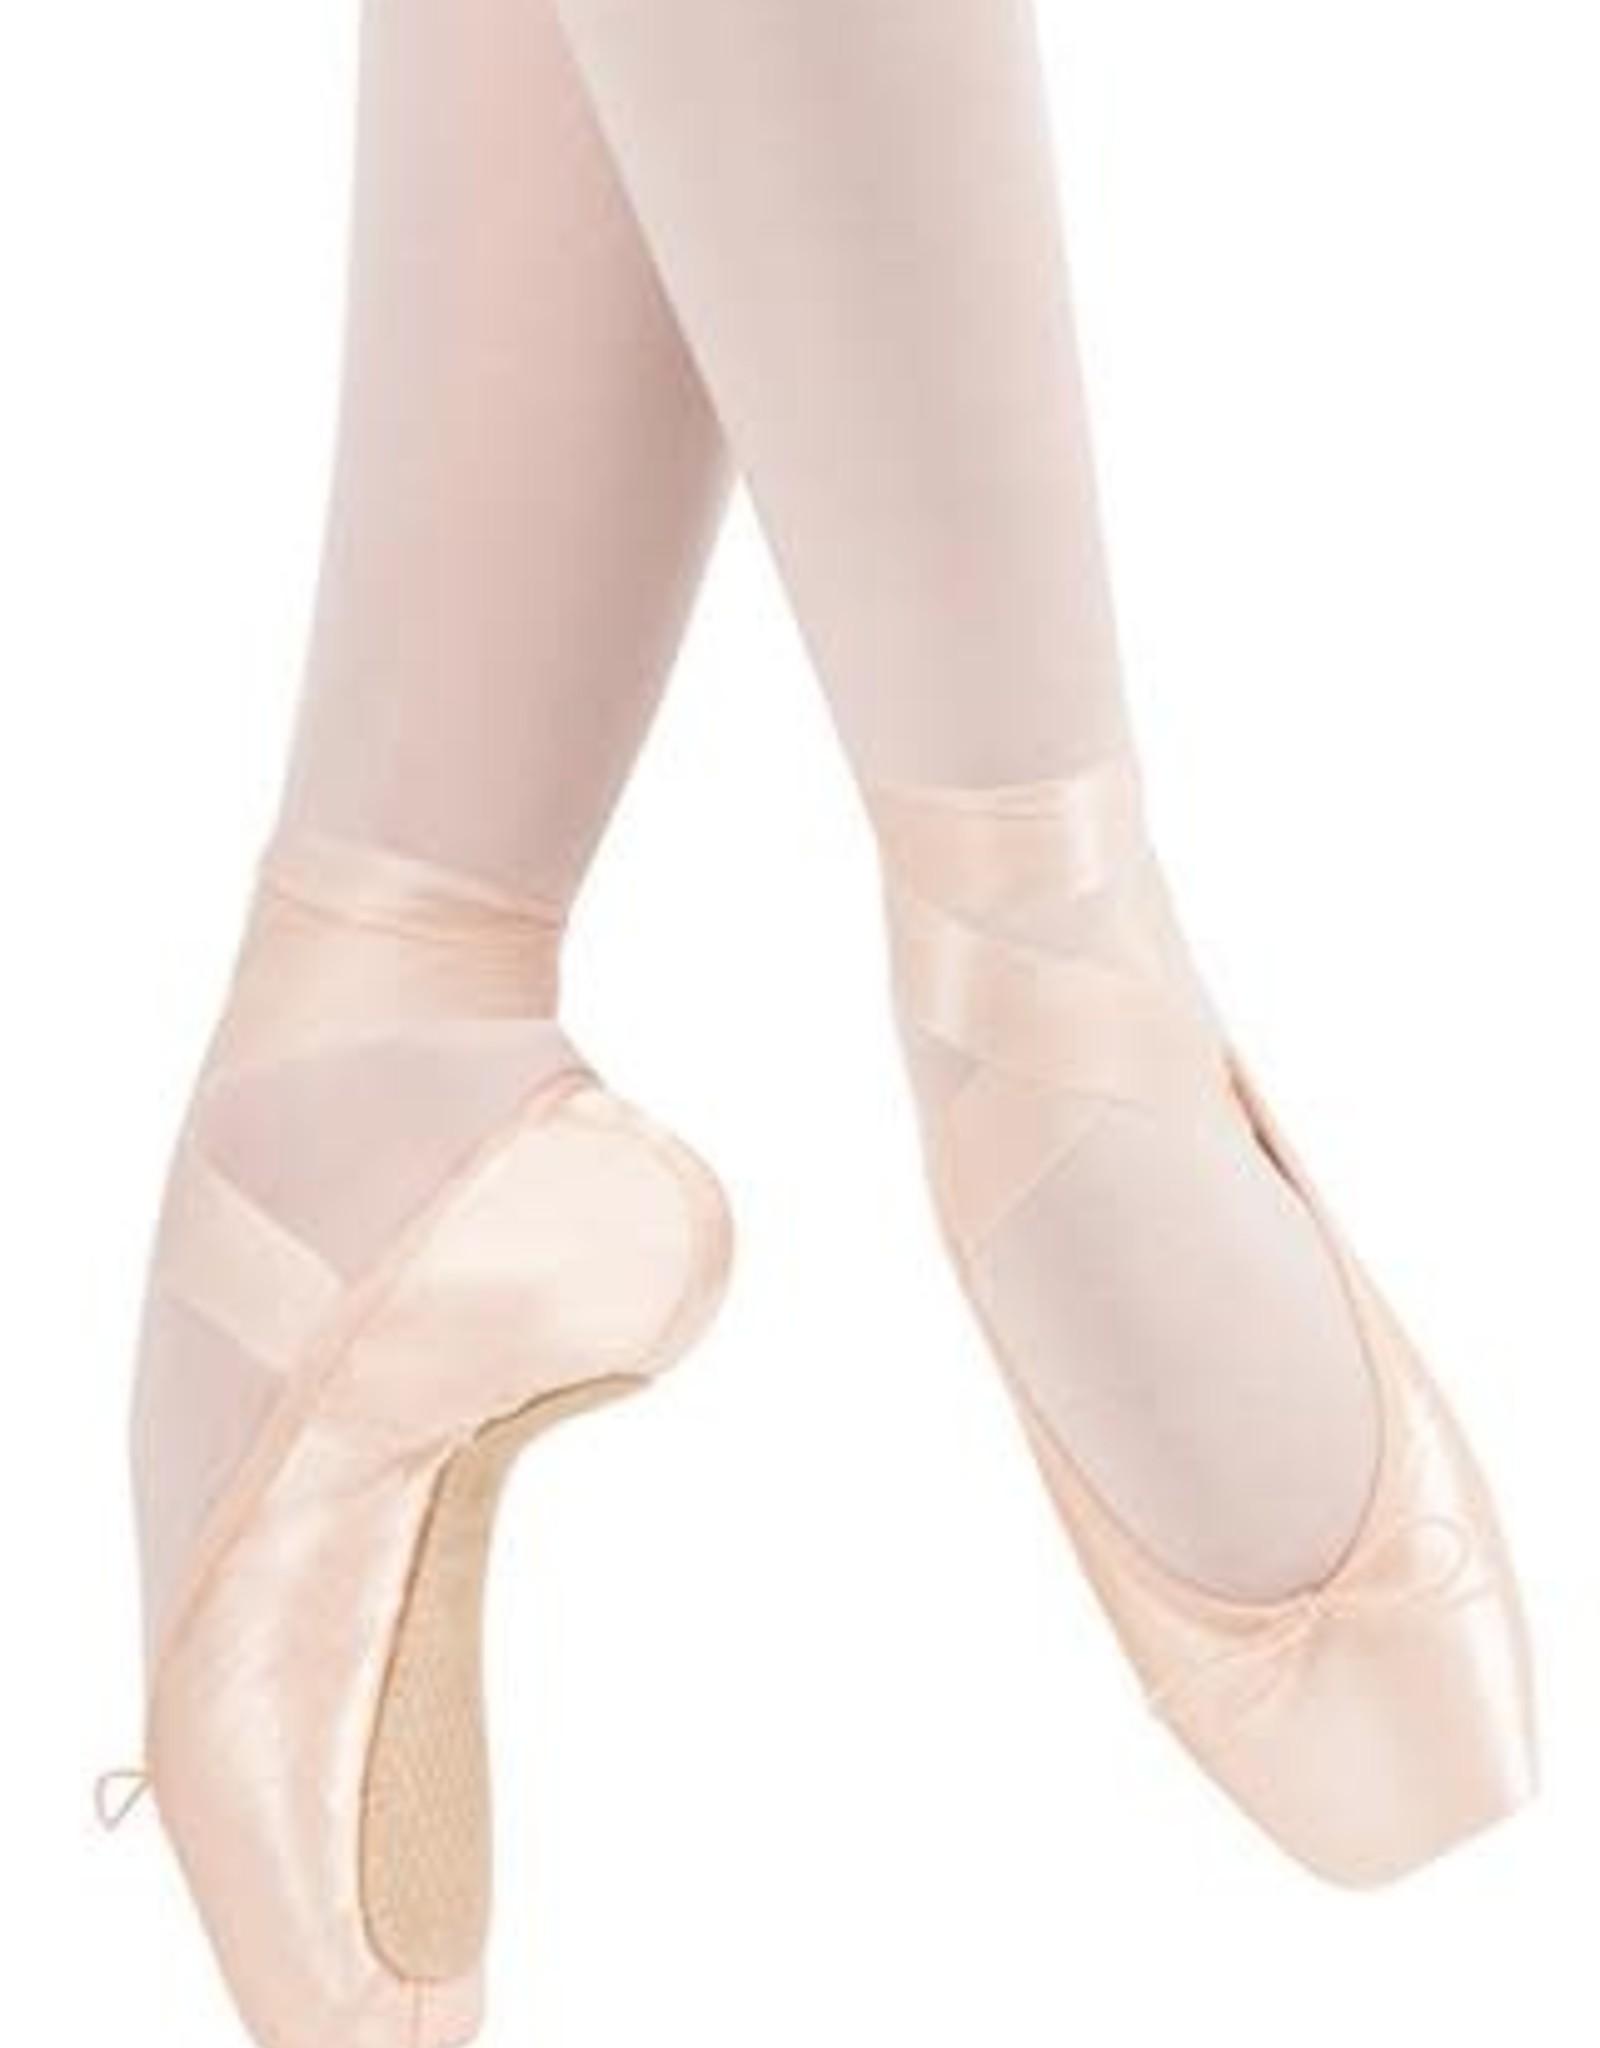 Nikolay Nikolay Dream Pointe (Allure) Pointe Shoes